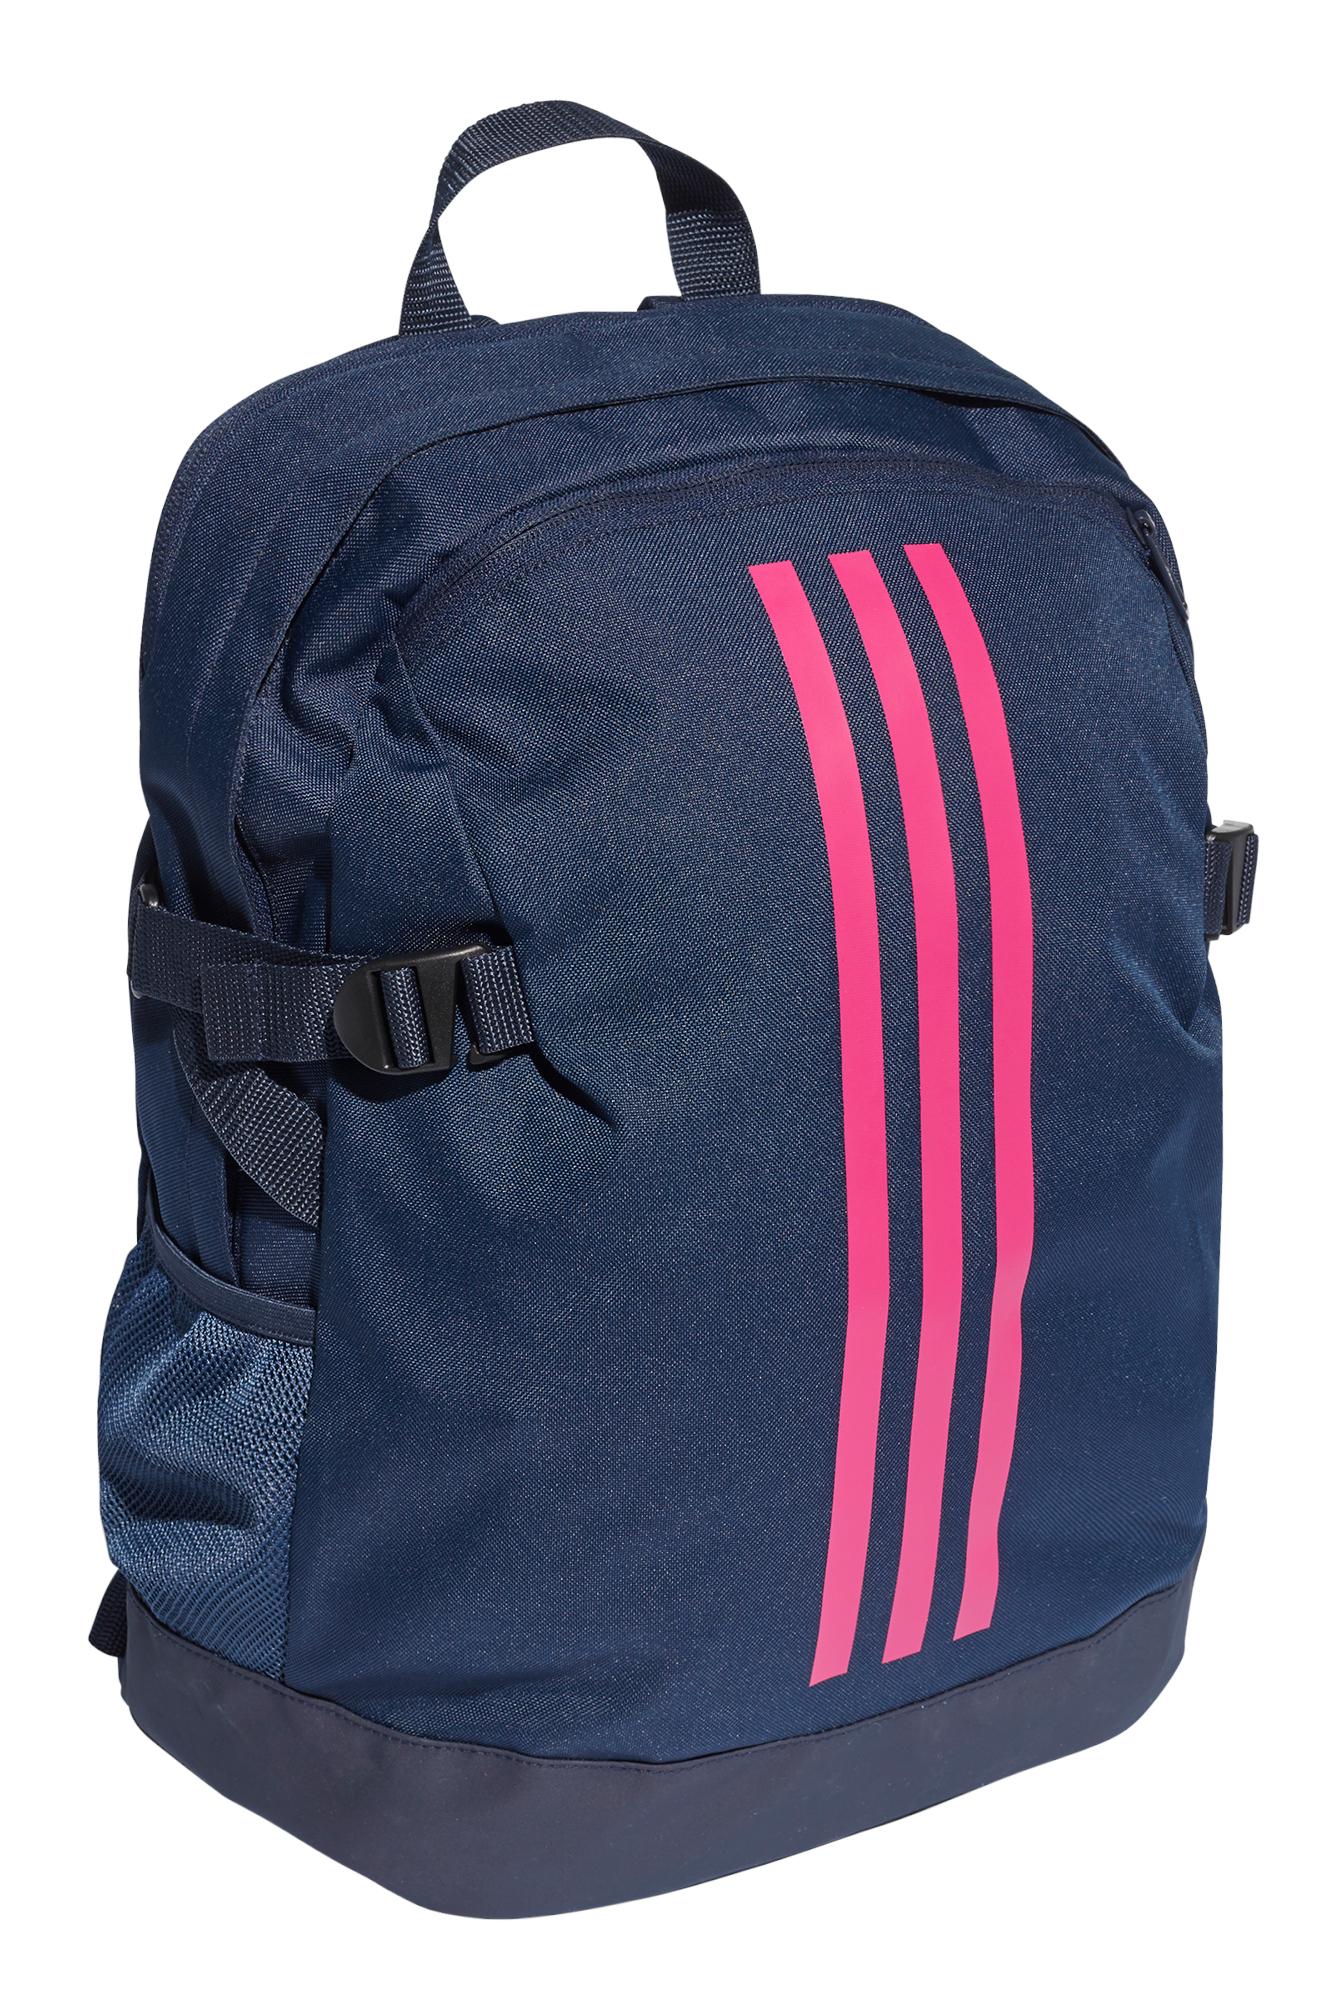 Plecak adidas 3 Stripes Power Medium DM7682 | odcienie